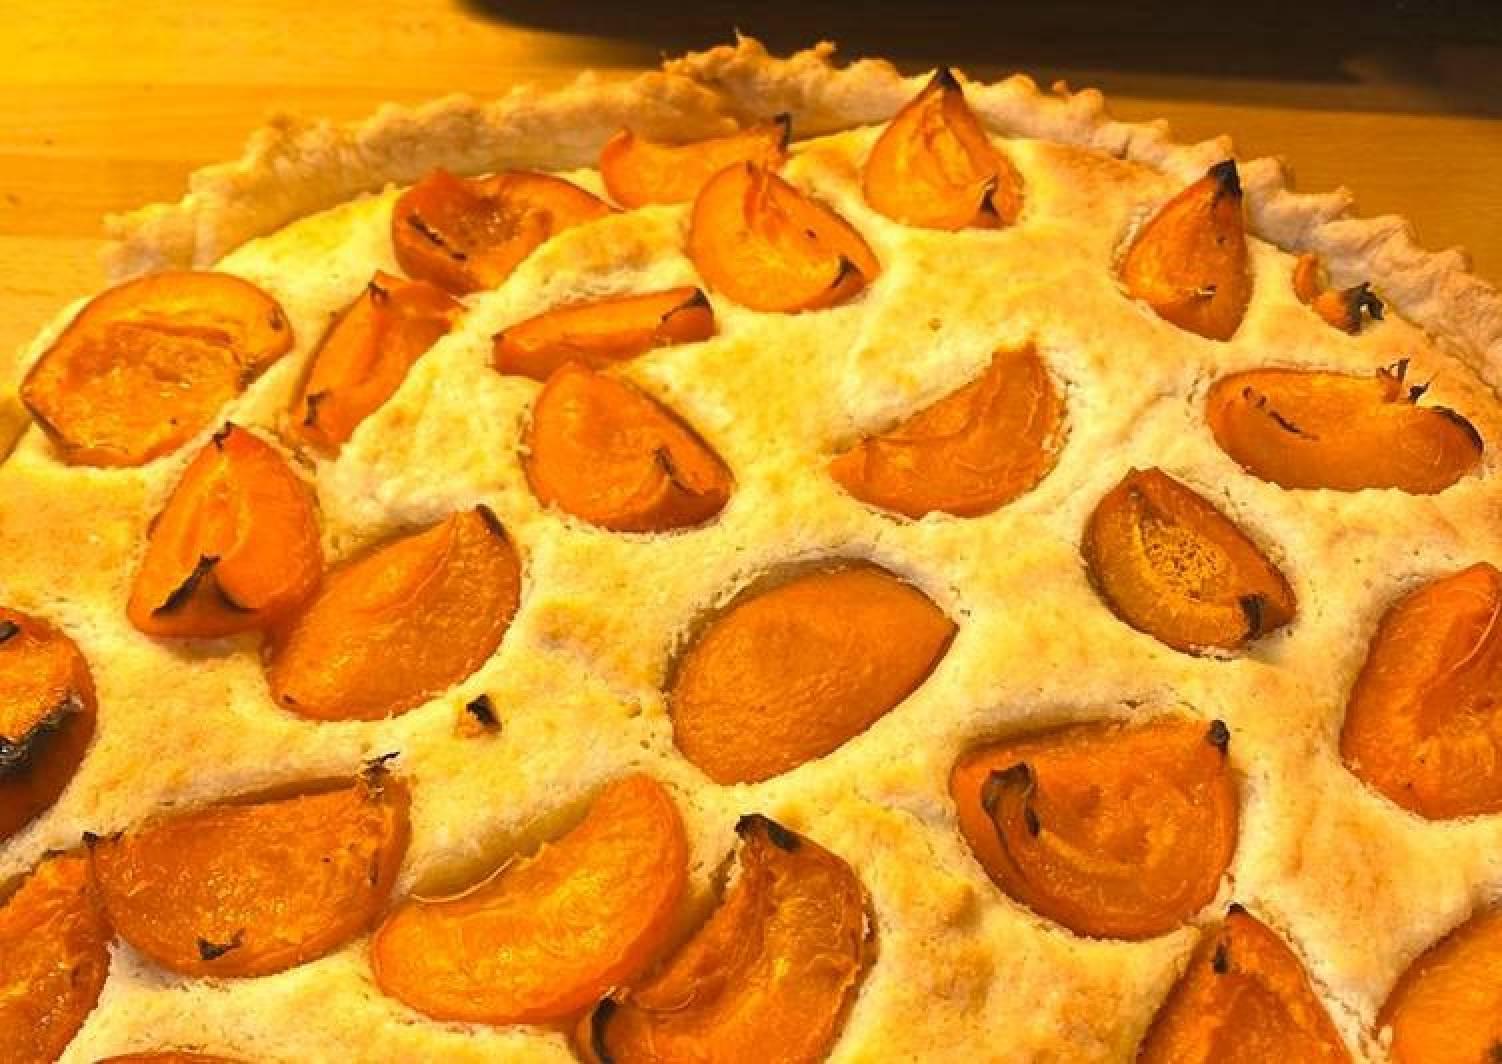 Apricot & almond frangipane tart